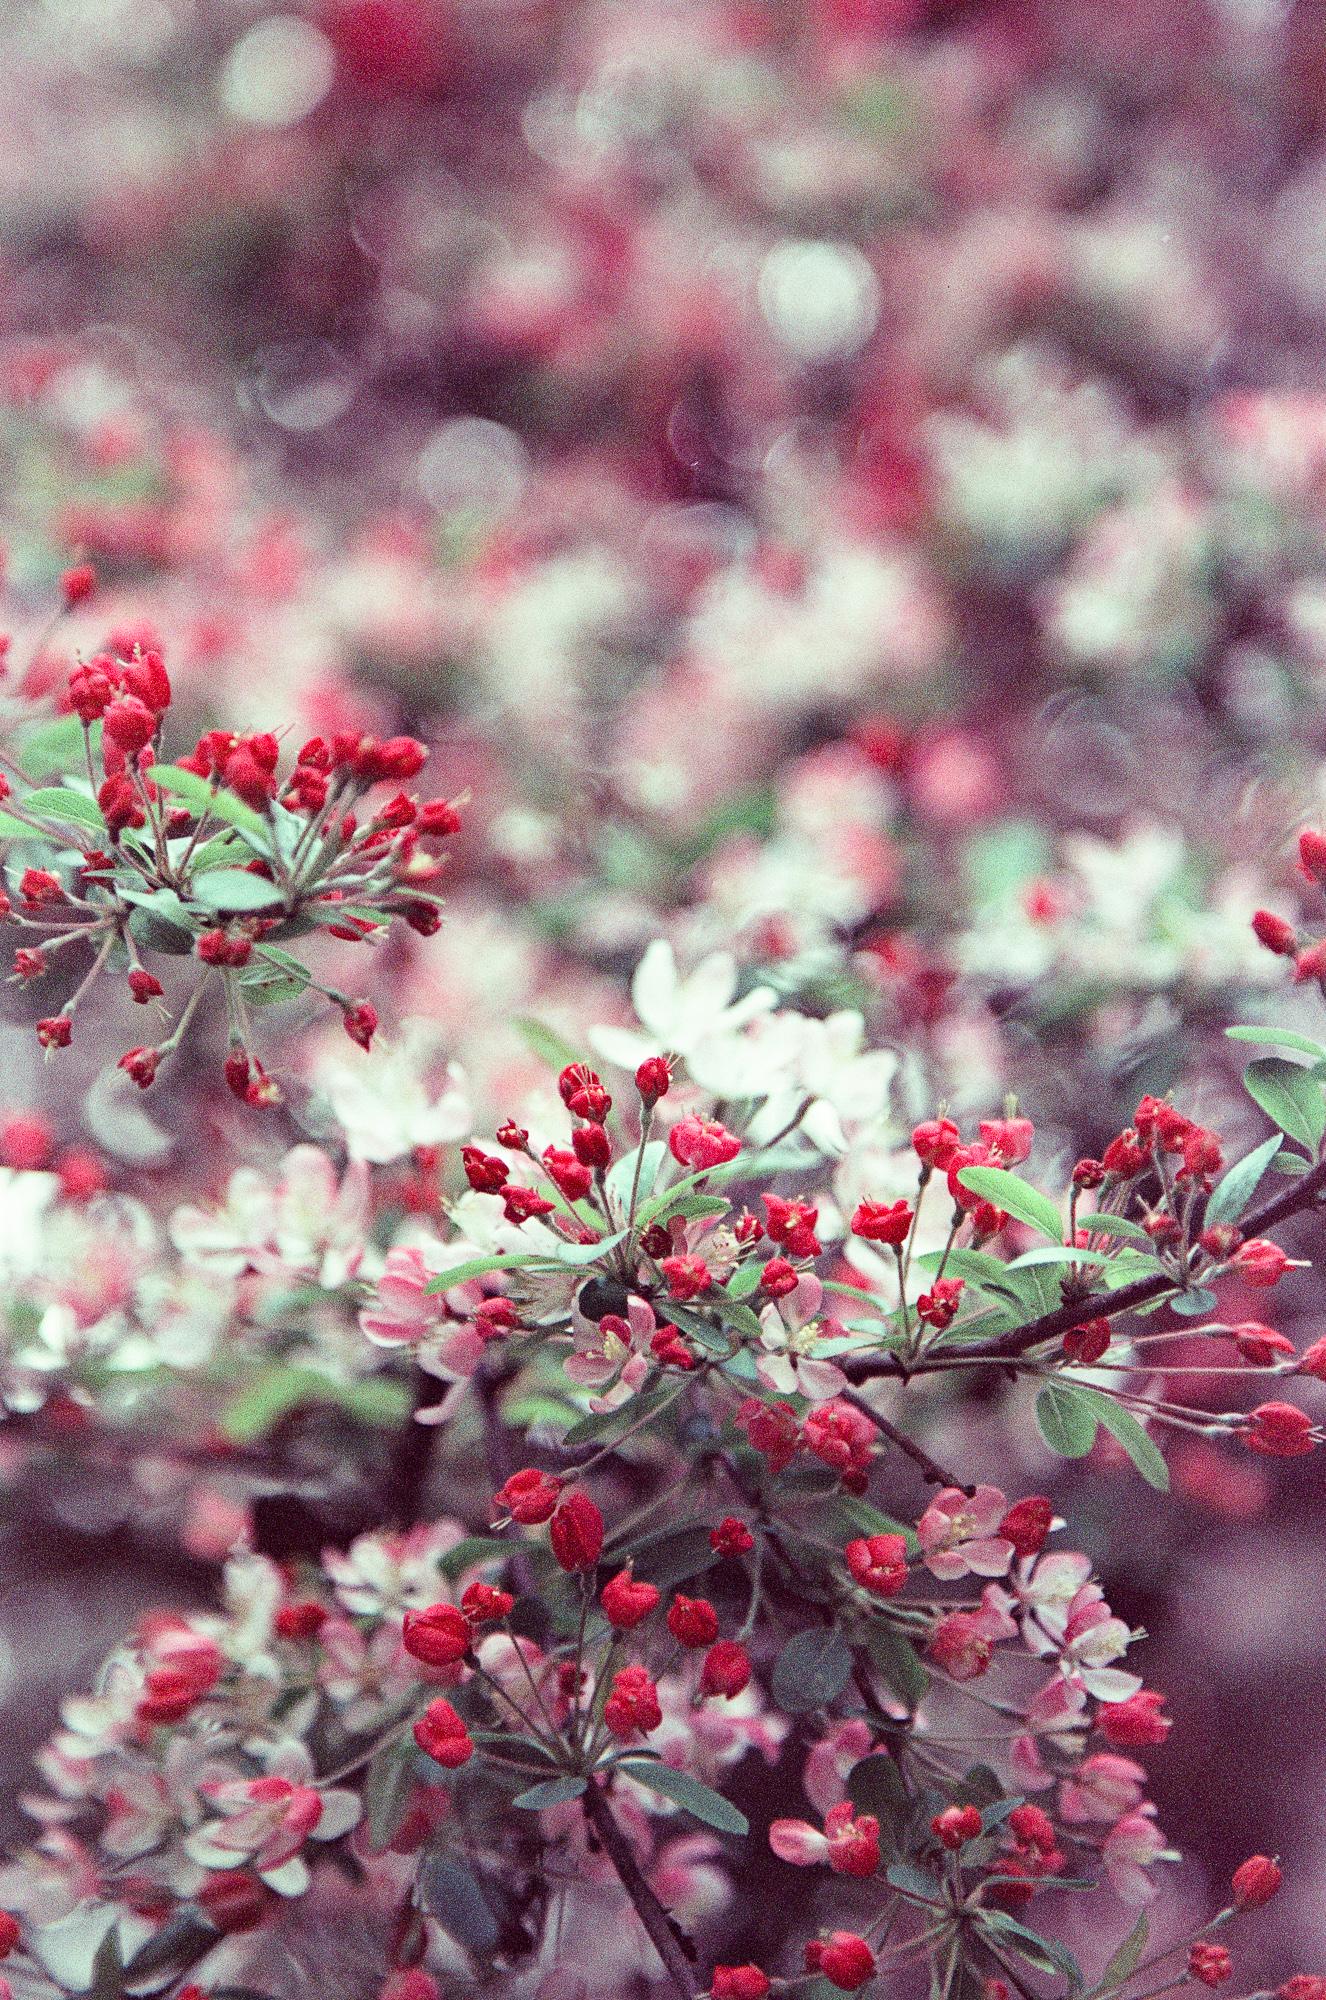 london-photographer-ksenia-zizina-flower-power-4